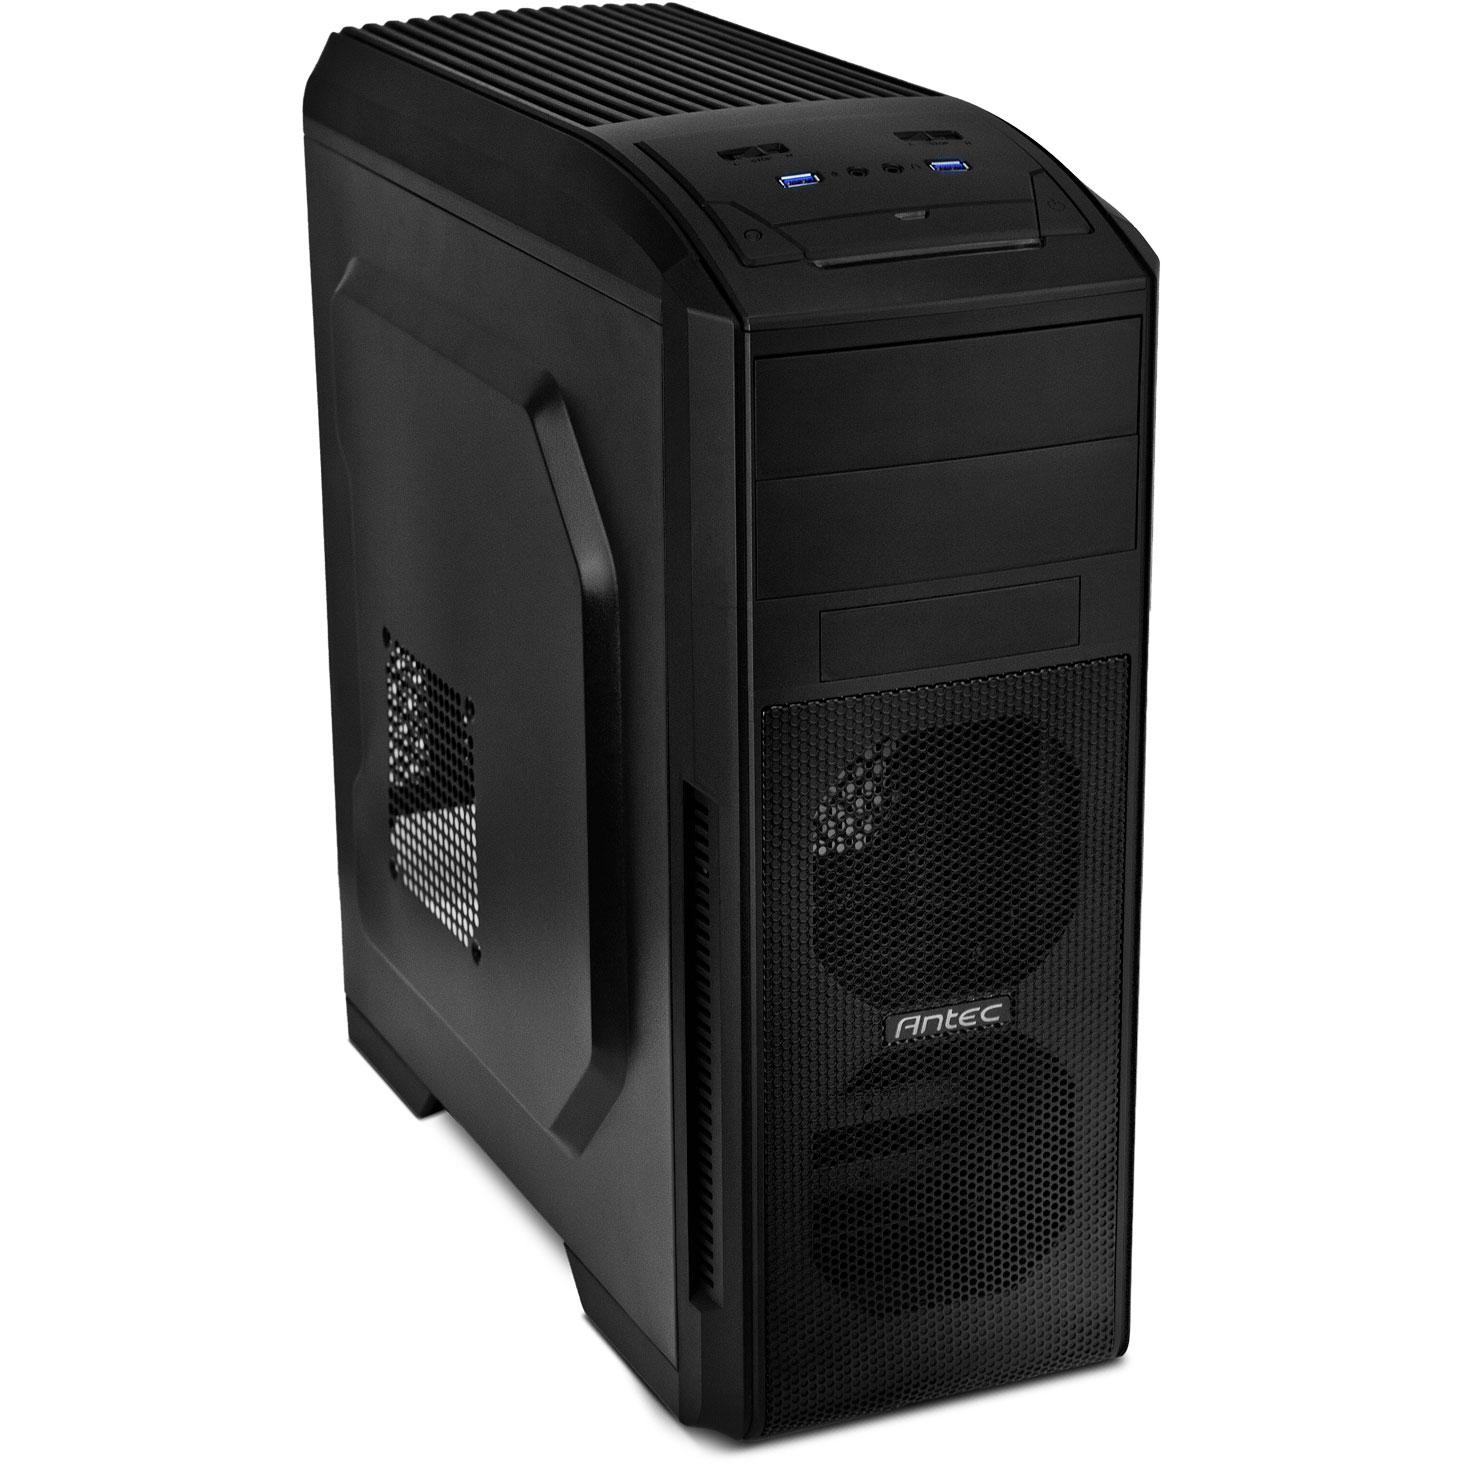 Boîtier PC Antec GX500 Window Boîtier Moyen Tour